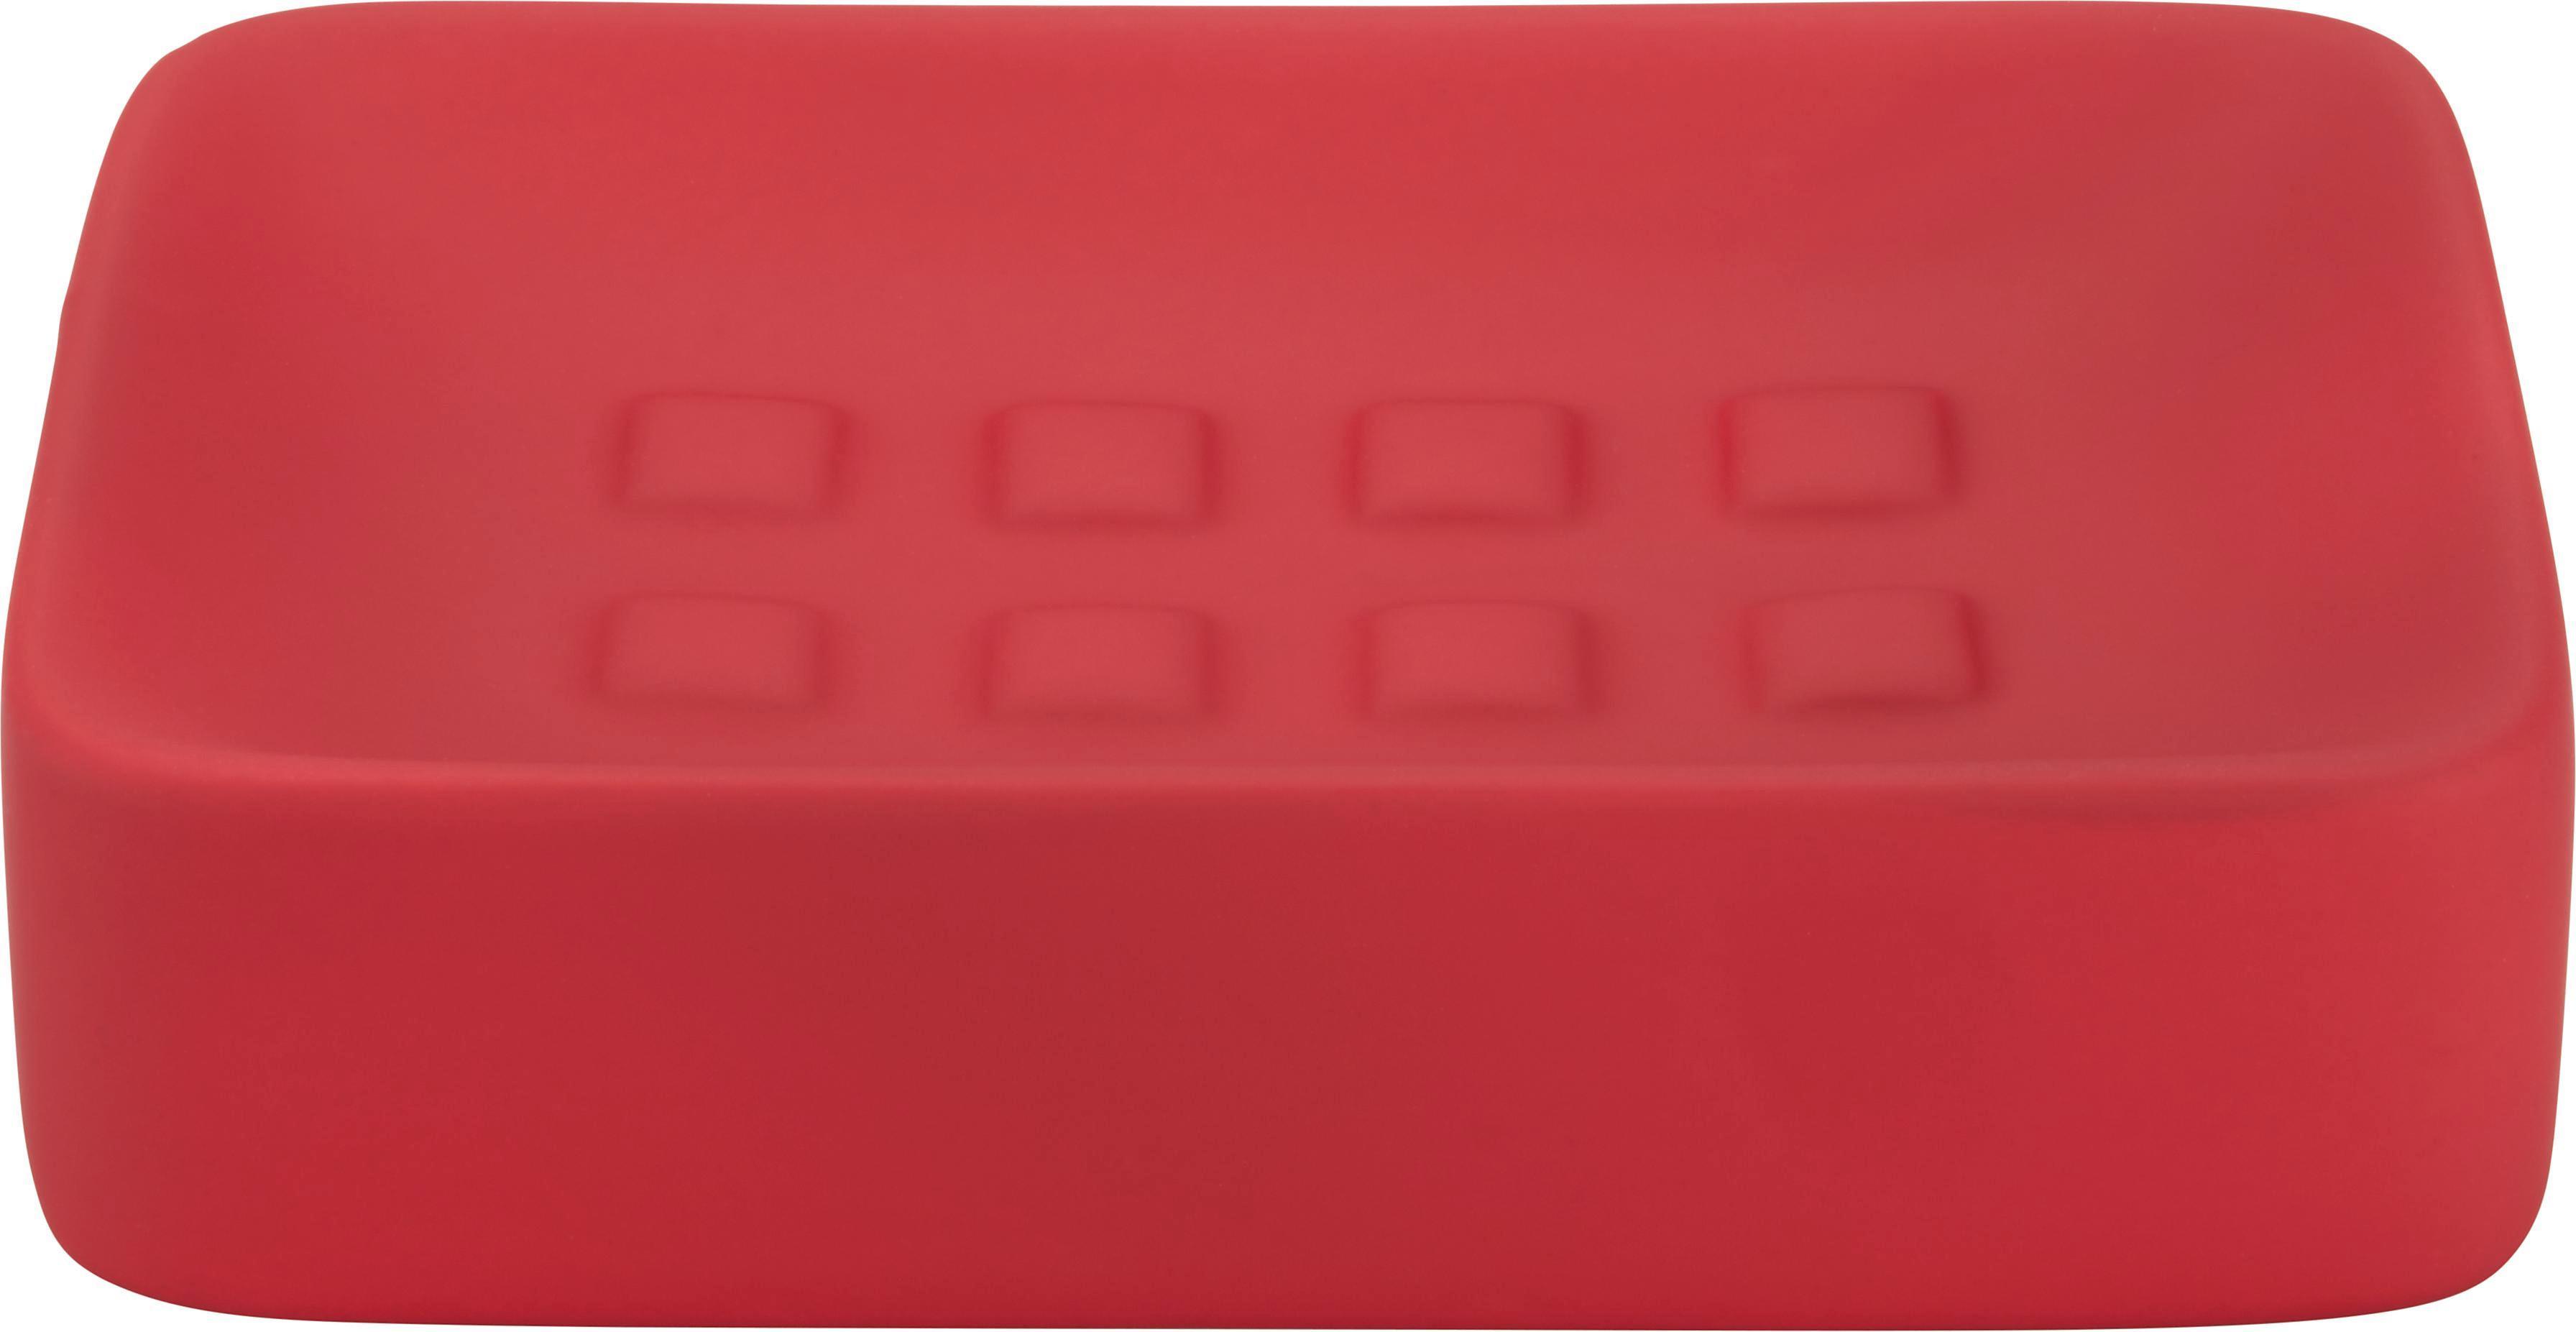 Seifenschale Melanie in Rot aus Keramik - Rot, Keramik (8,3/12,5cm) - MÖMAX modern living